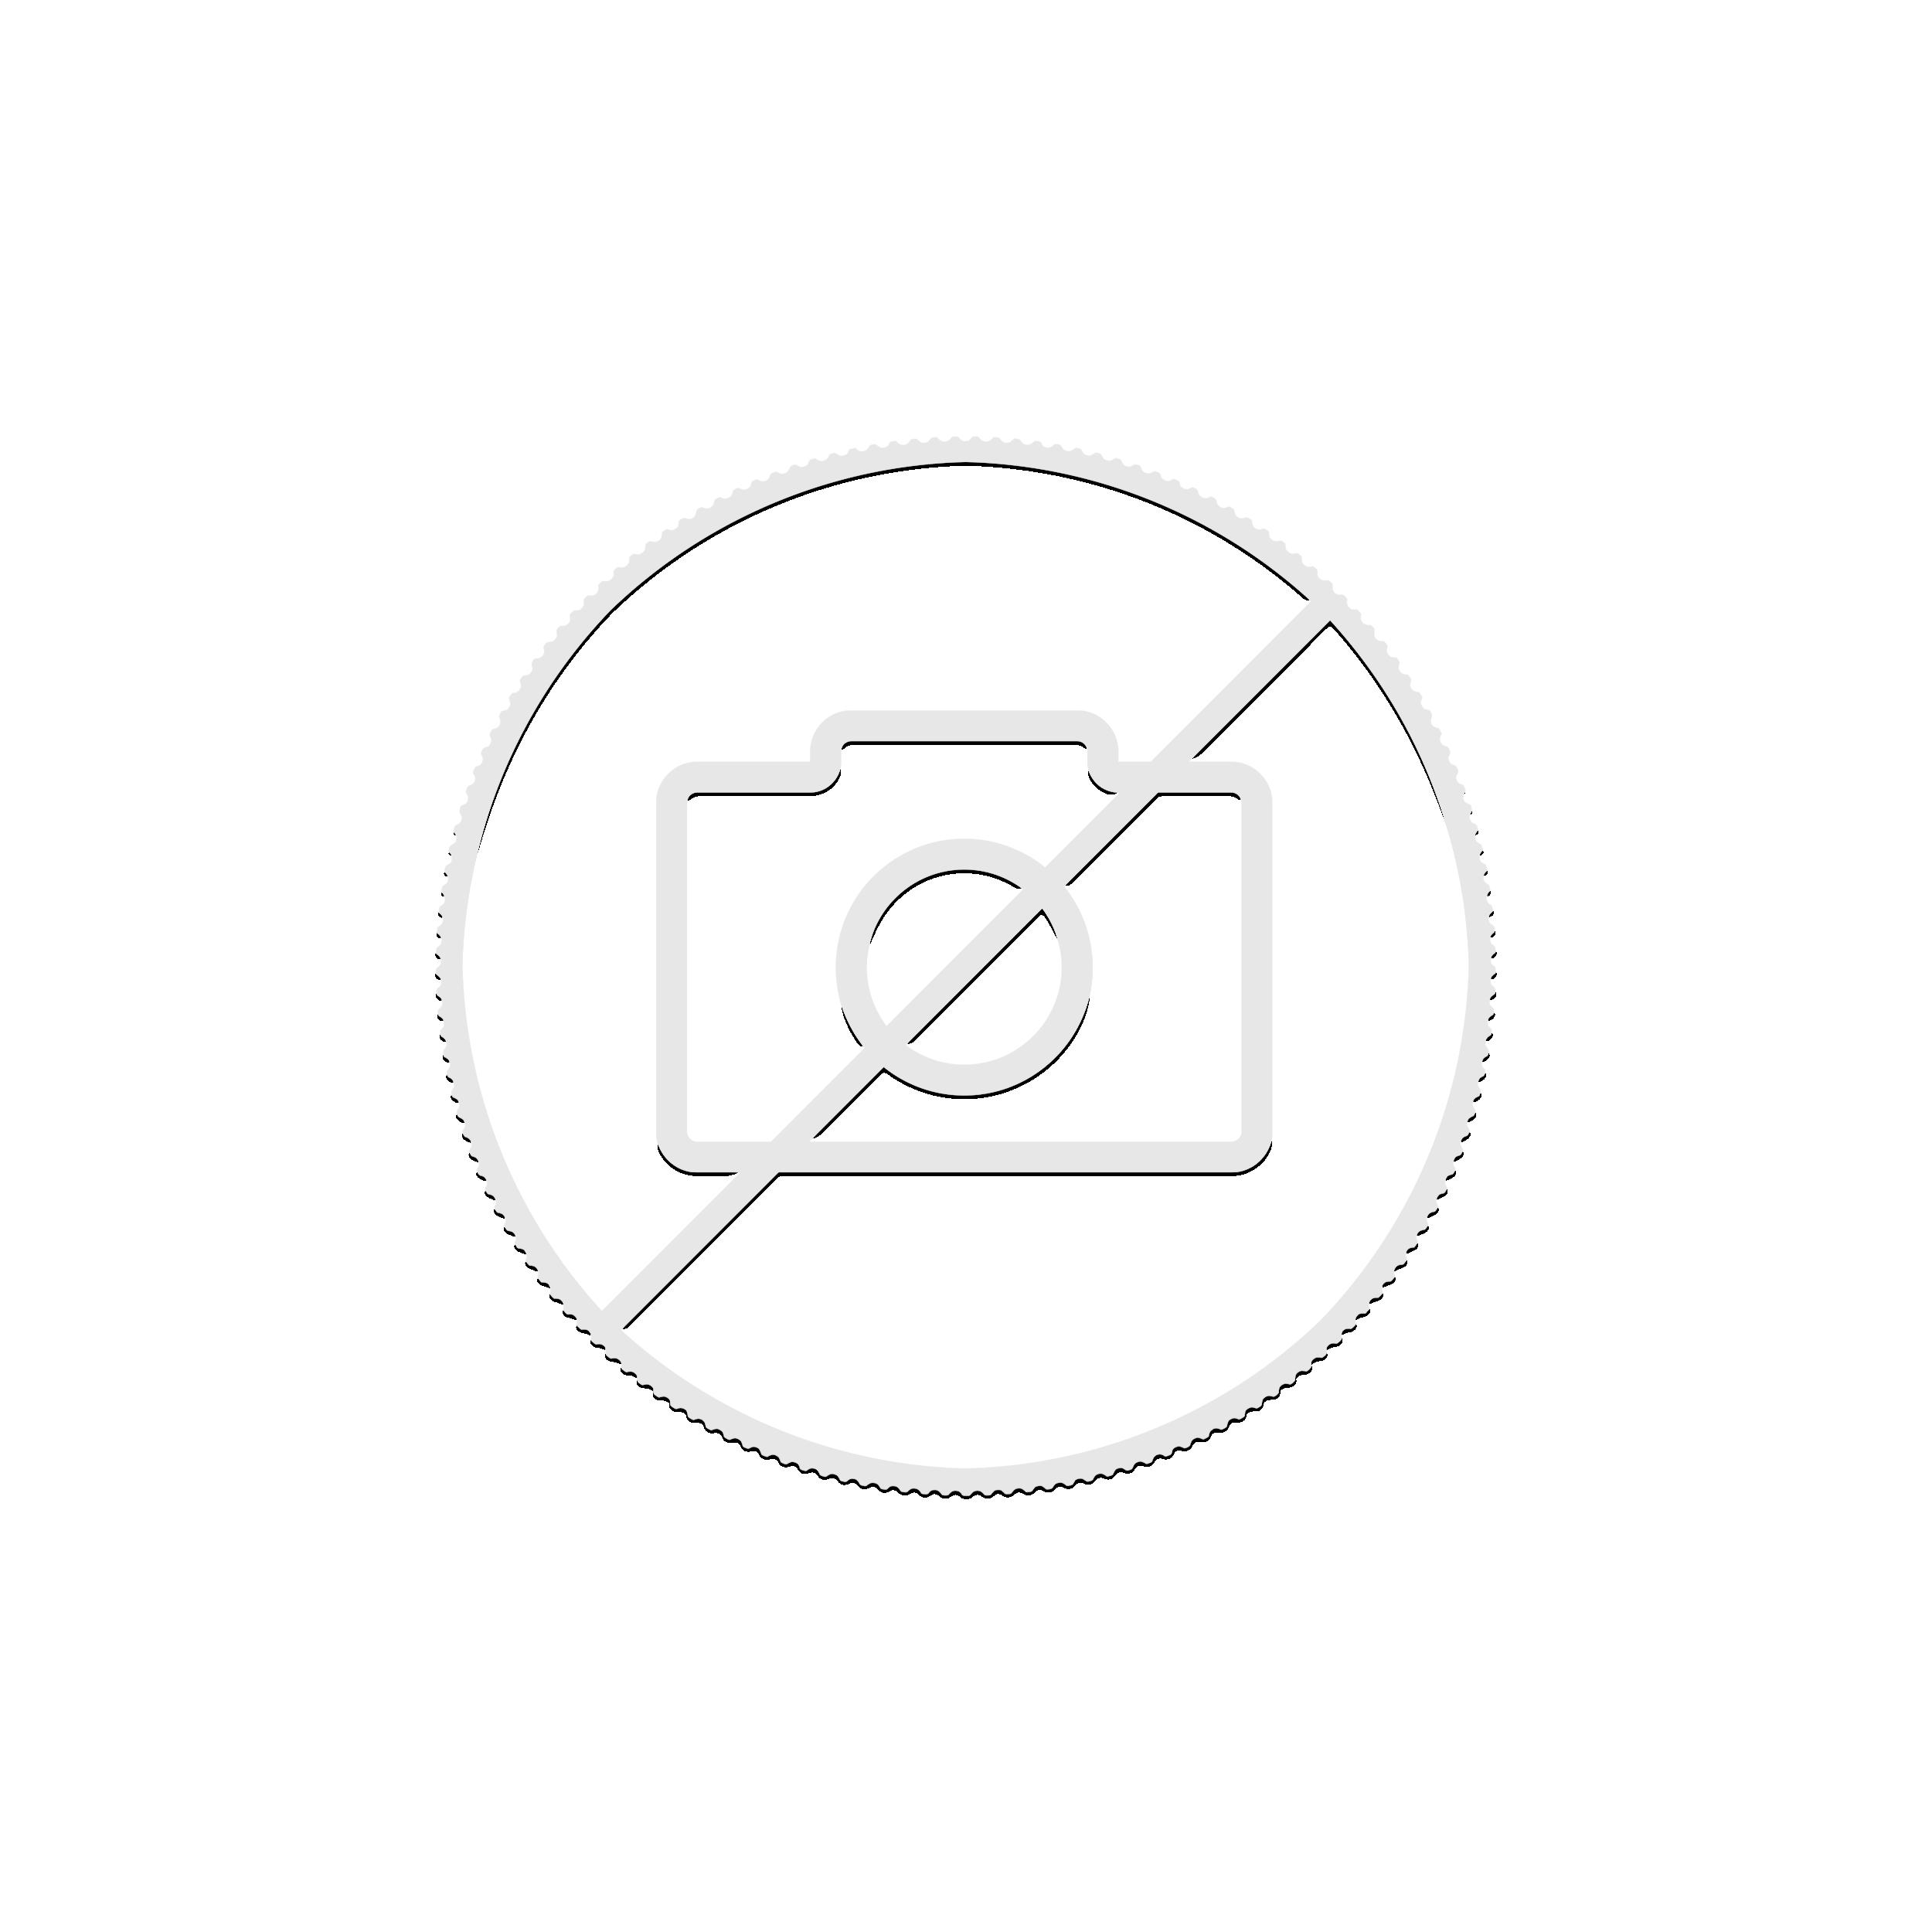 30 Gram gold coin Panda 2020